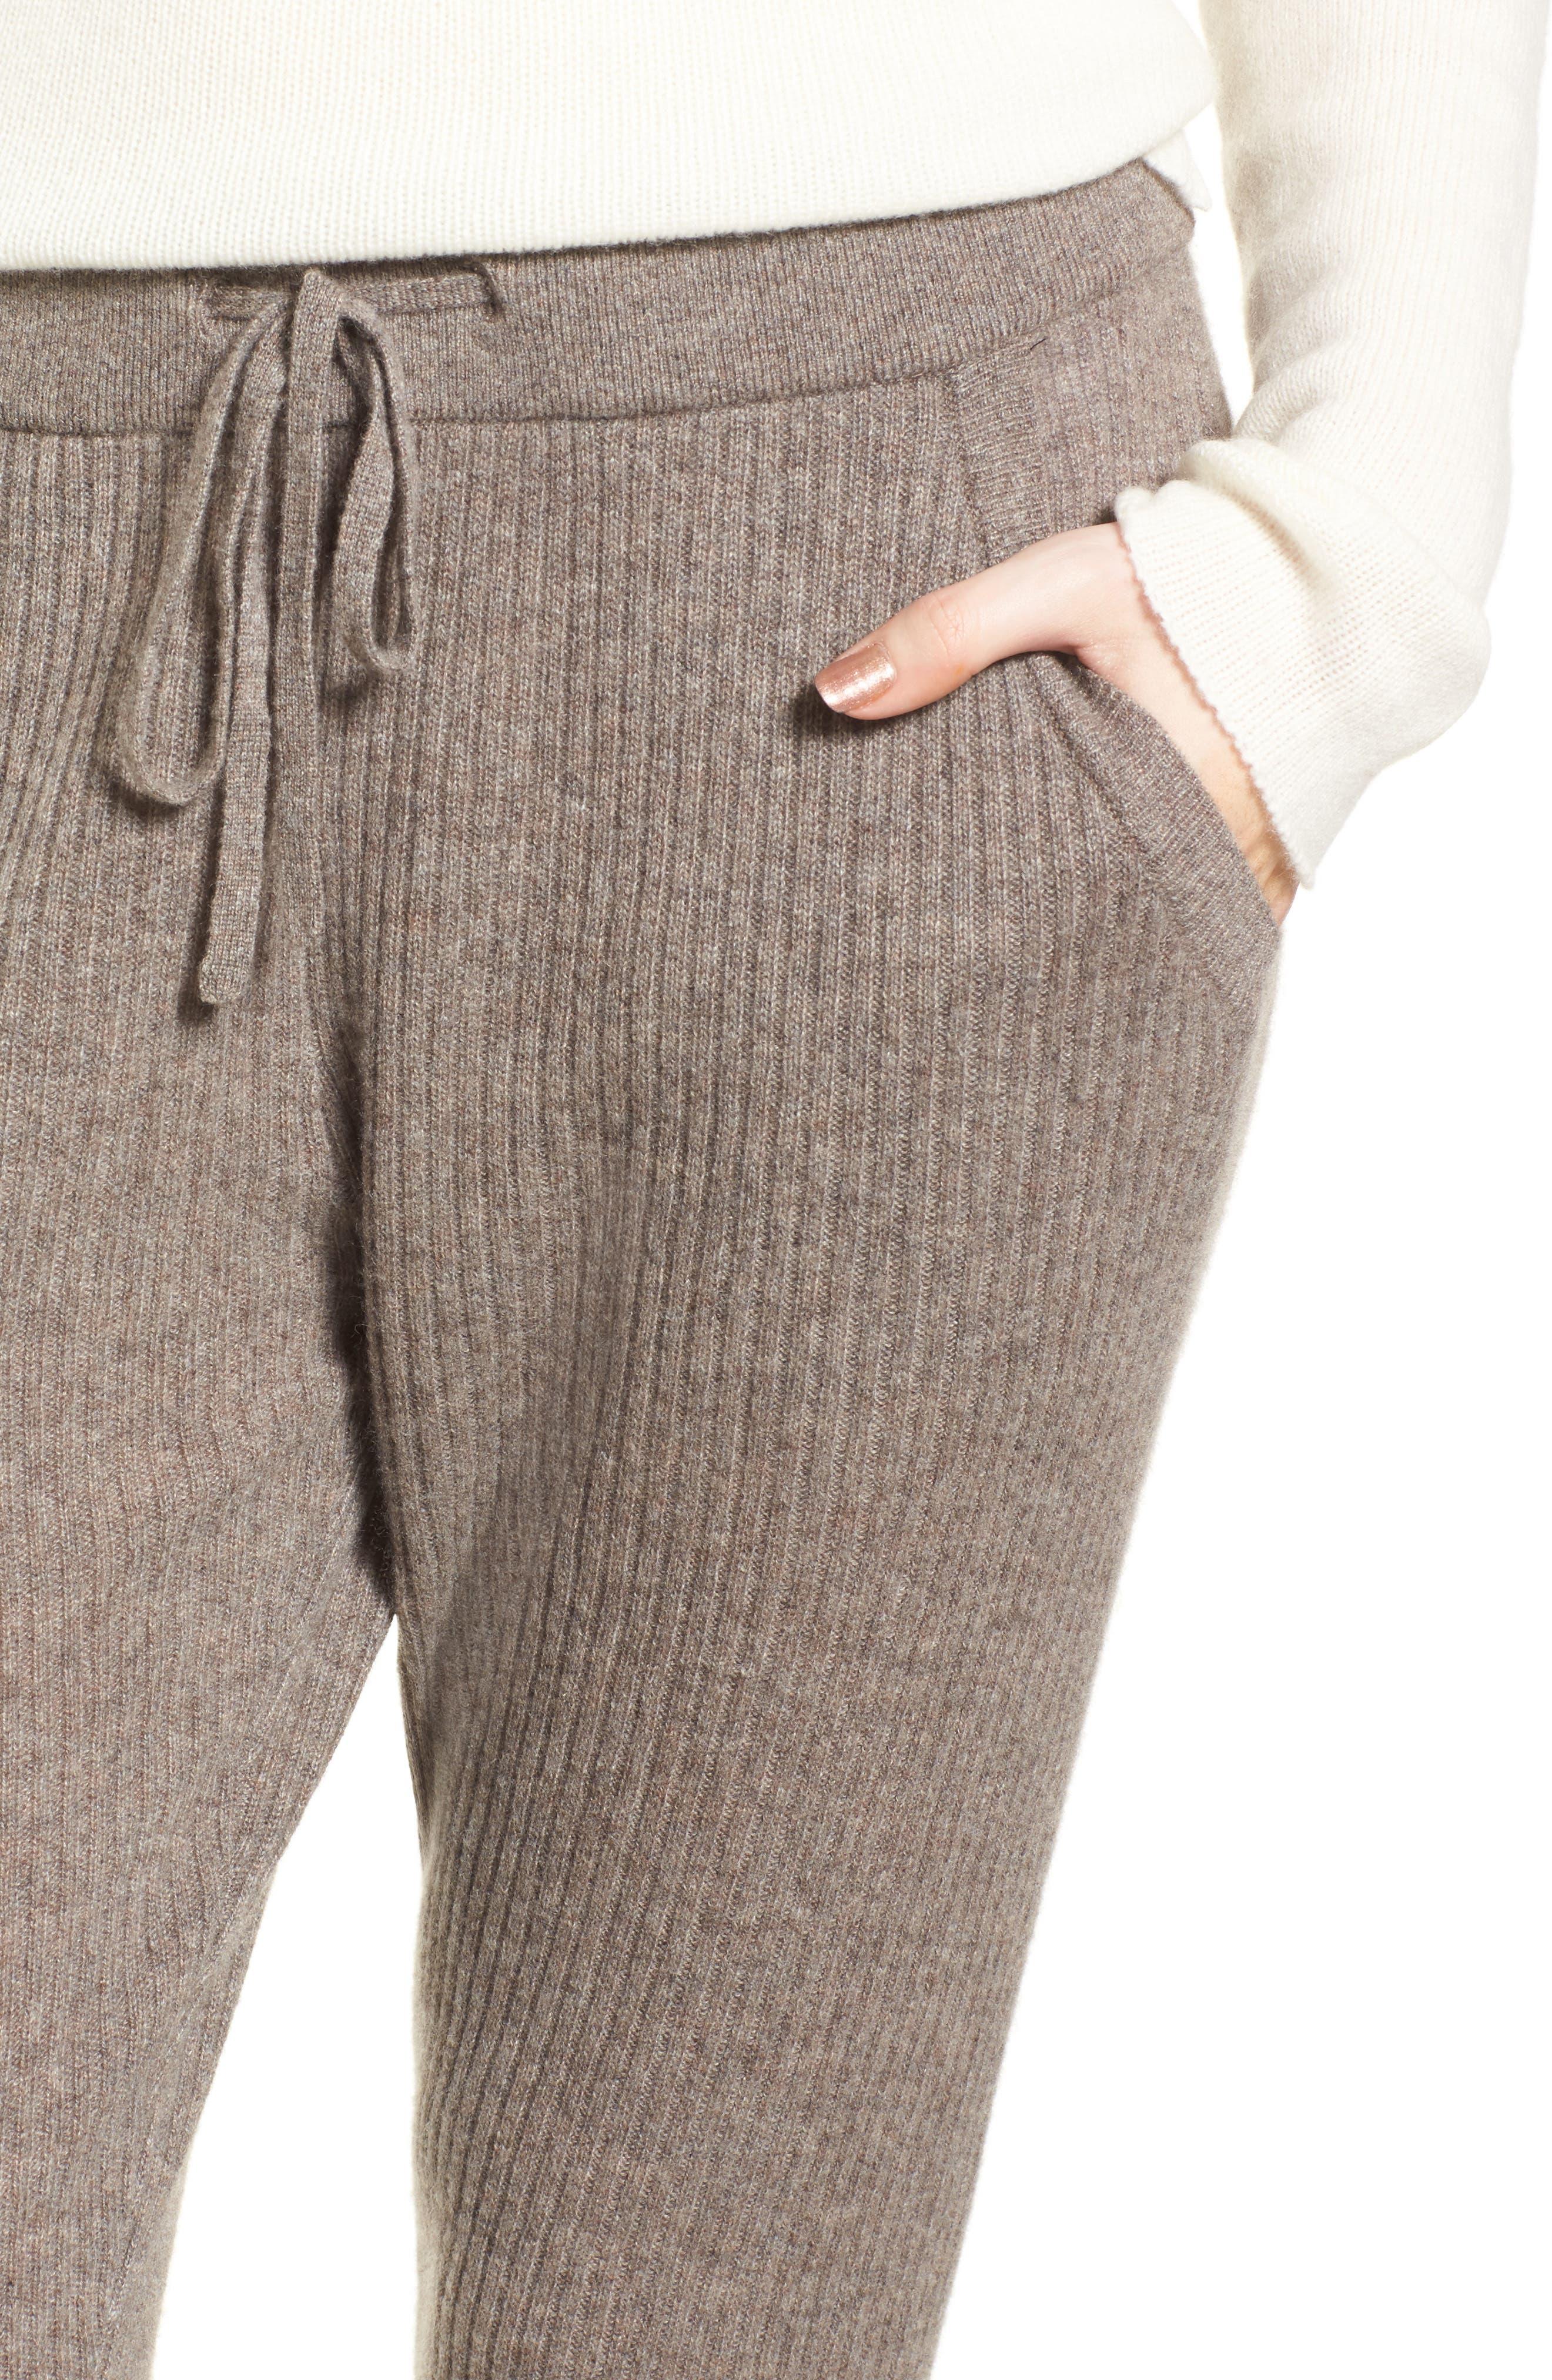 Ribbed Cashmere Leggings,                             Alternate thumbnail 4, color,                             Taupe Melange